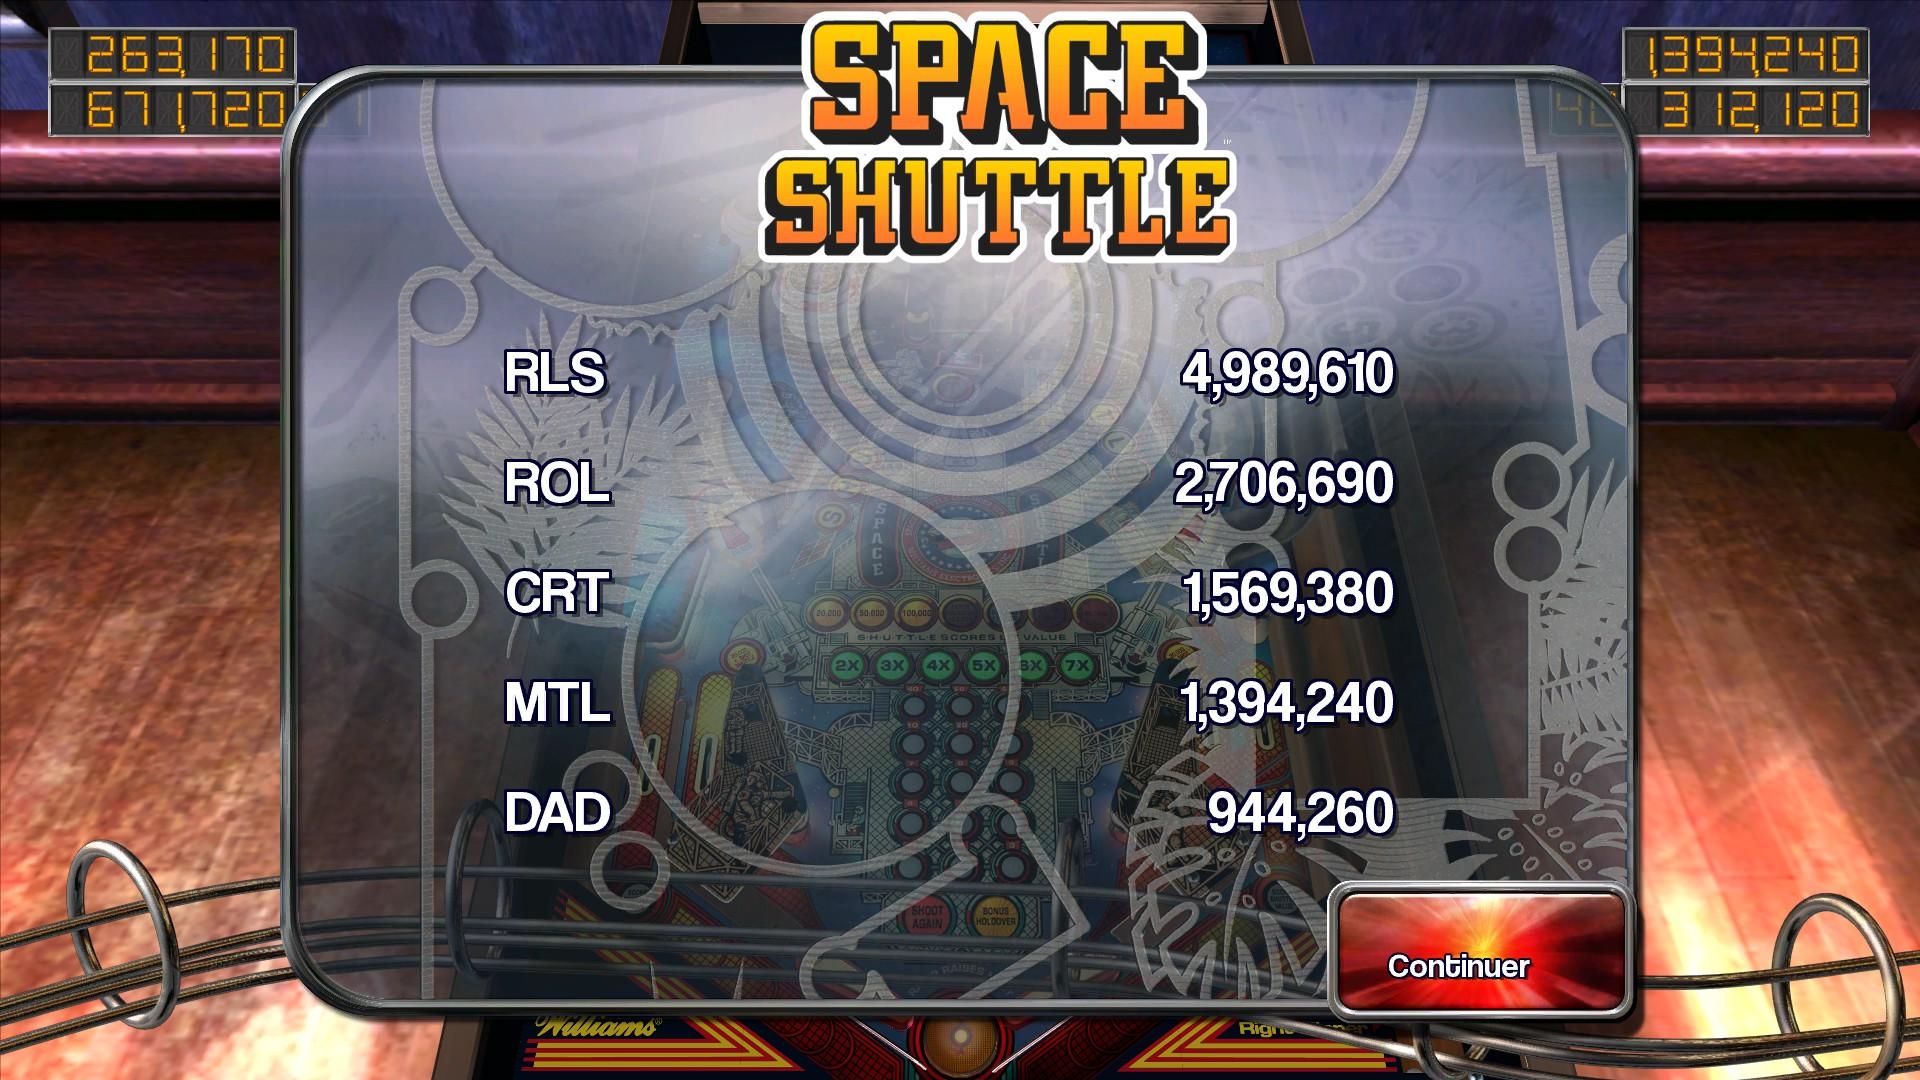 Mantalow: Pinball Arcade: Space Shuttle (PC) 1,394,240 points on 2015-03-06 11:18:38